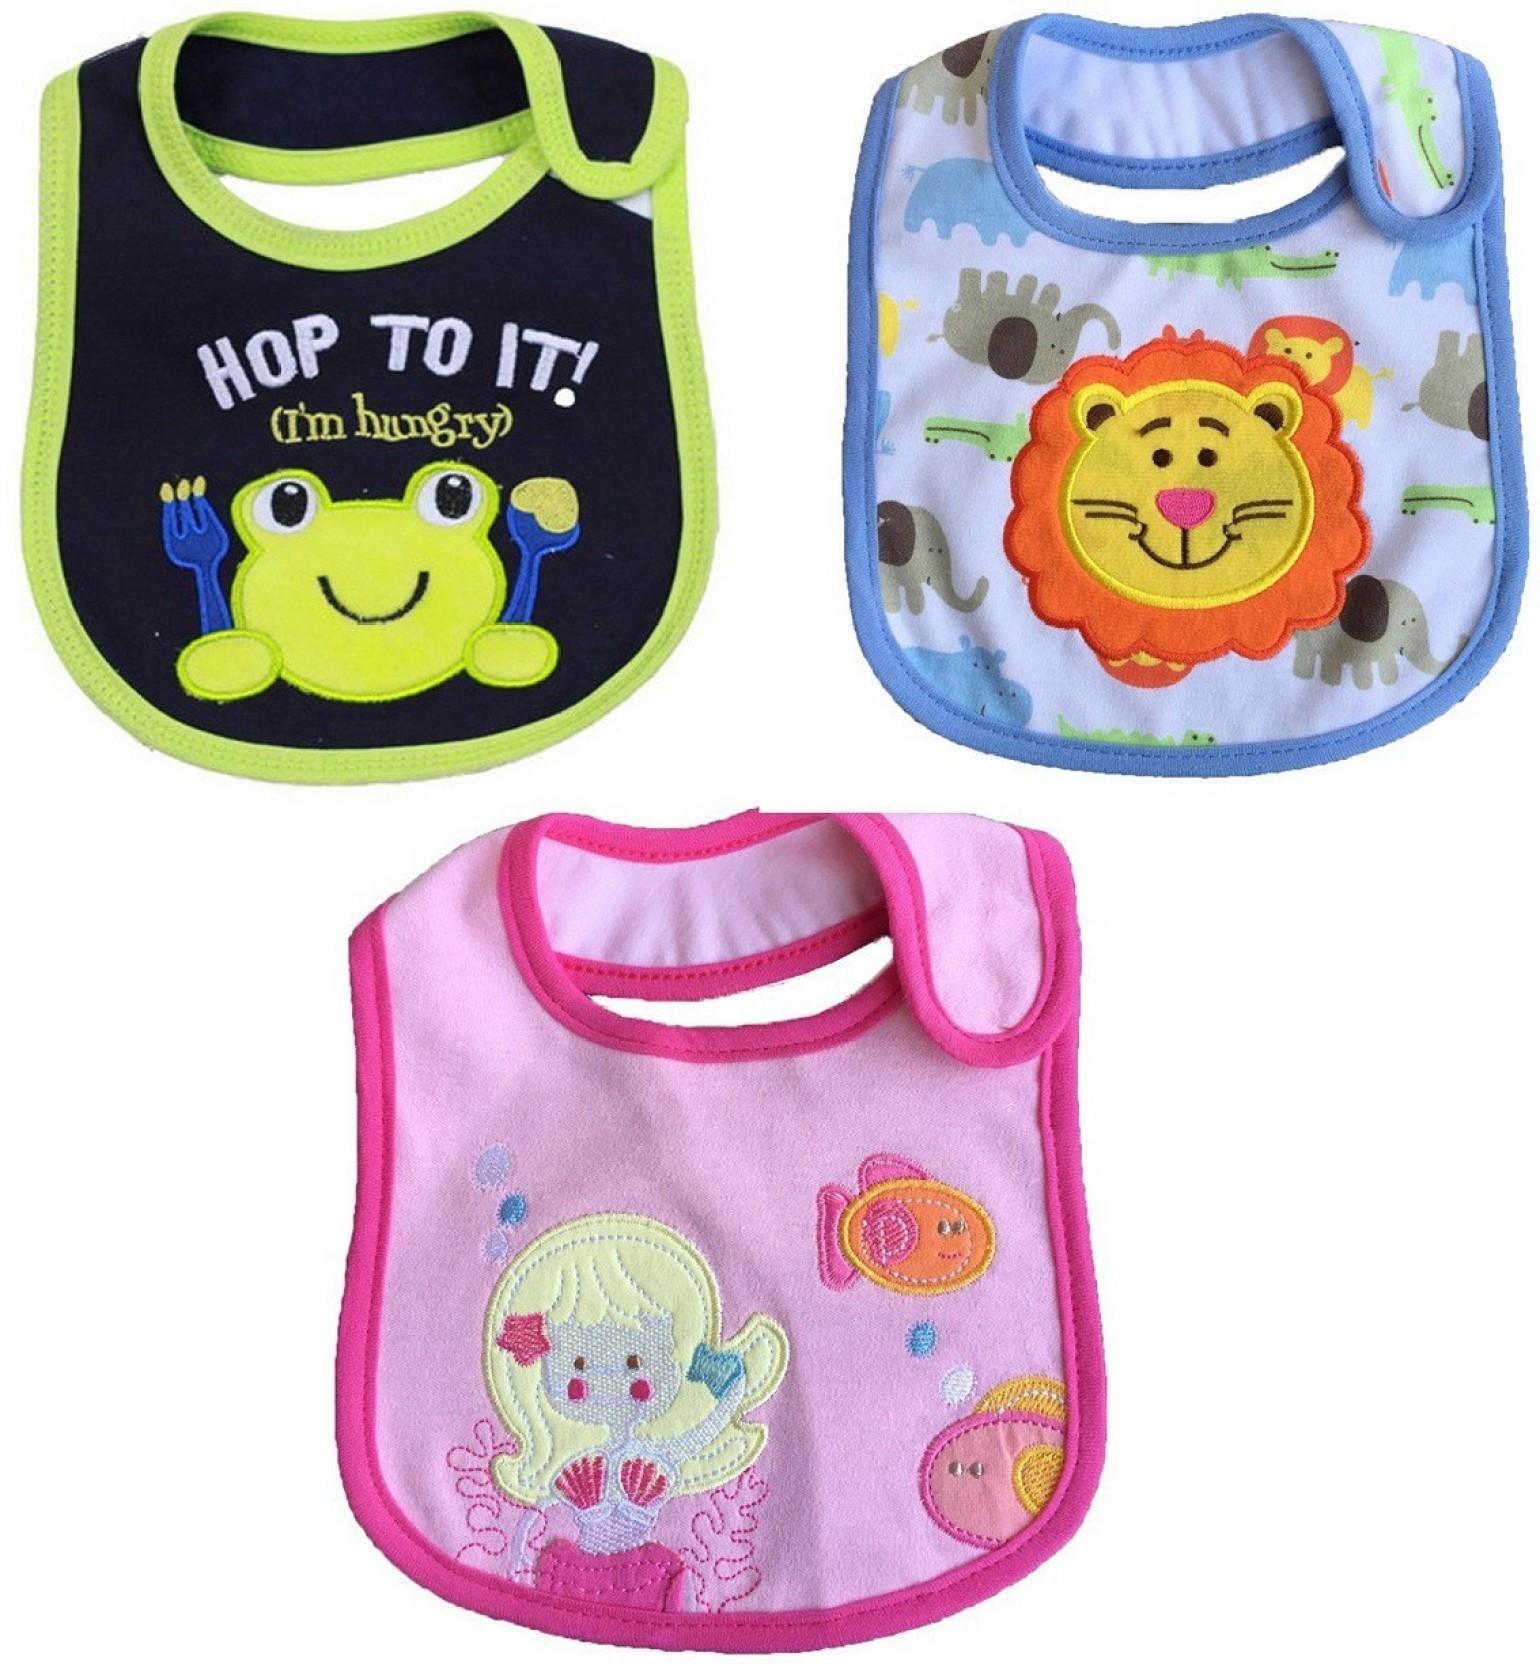 321d8e72aec8 Wishkey Baby Bibs for New Born Infants Set of 3